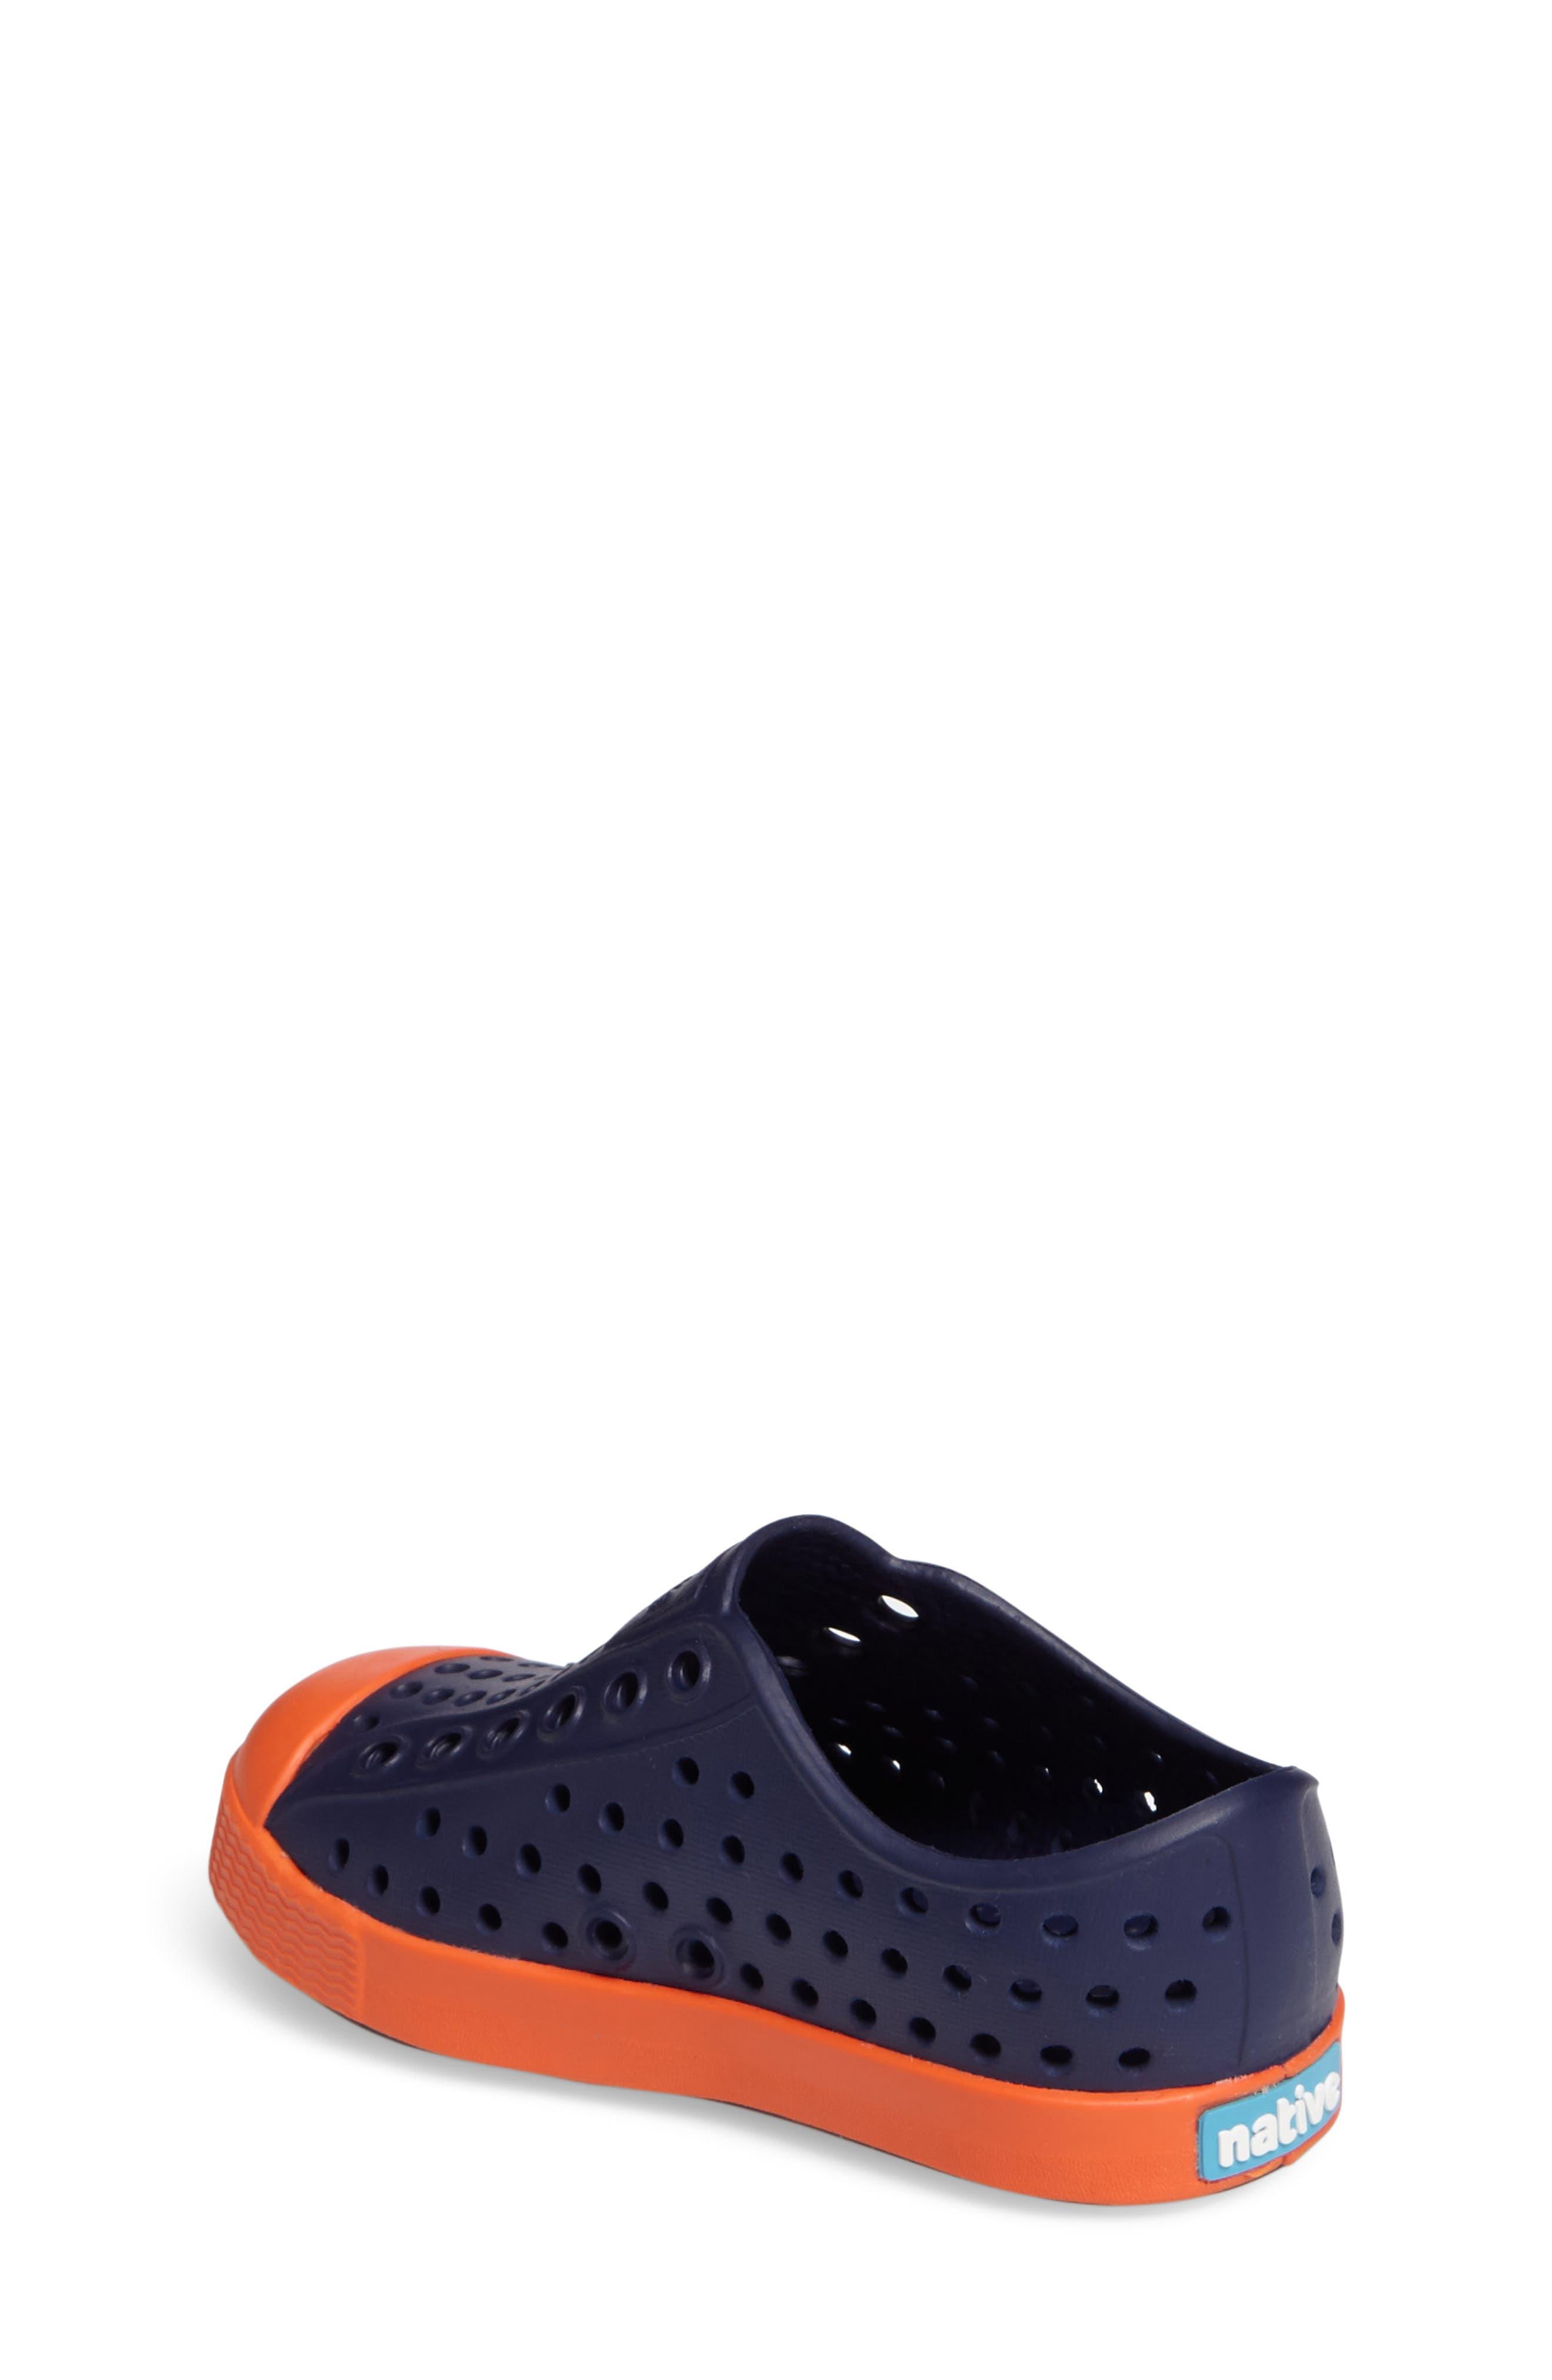 'Jefferson' Water Friendly Slip-On Sneaker,                             Alternate thumbnail 100, color,